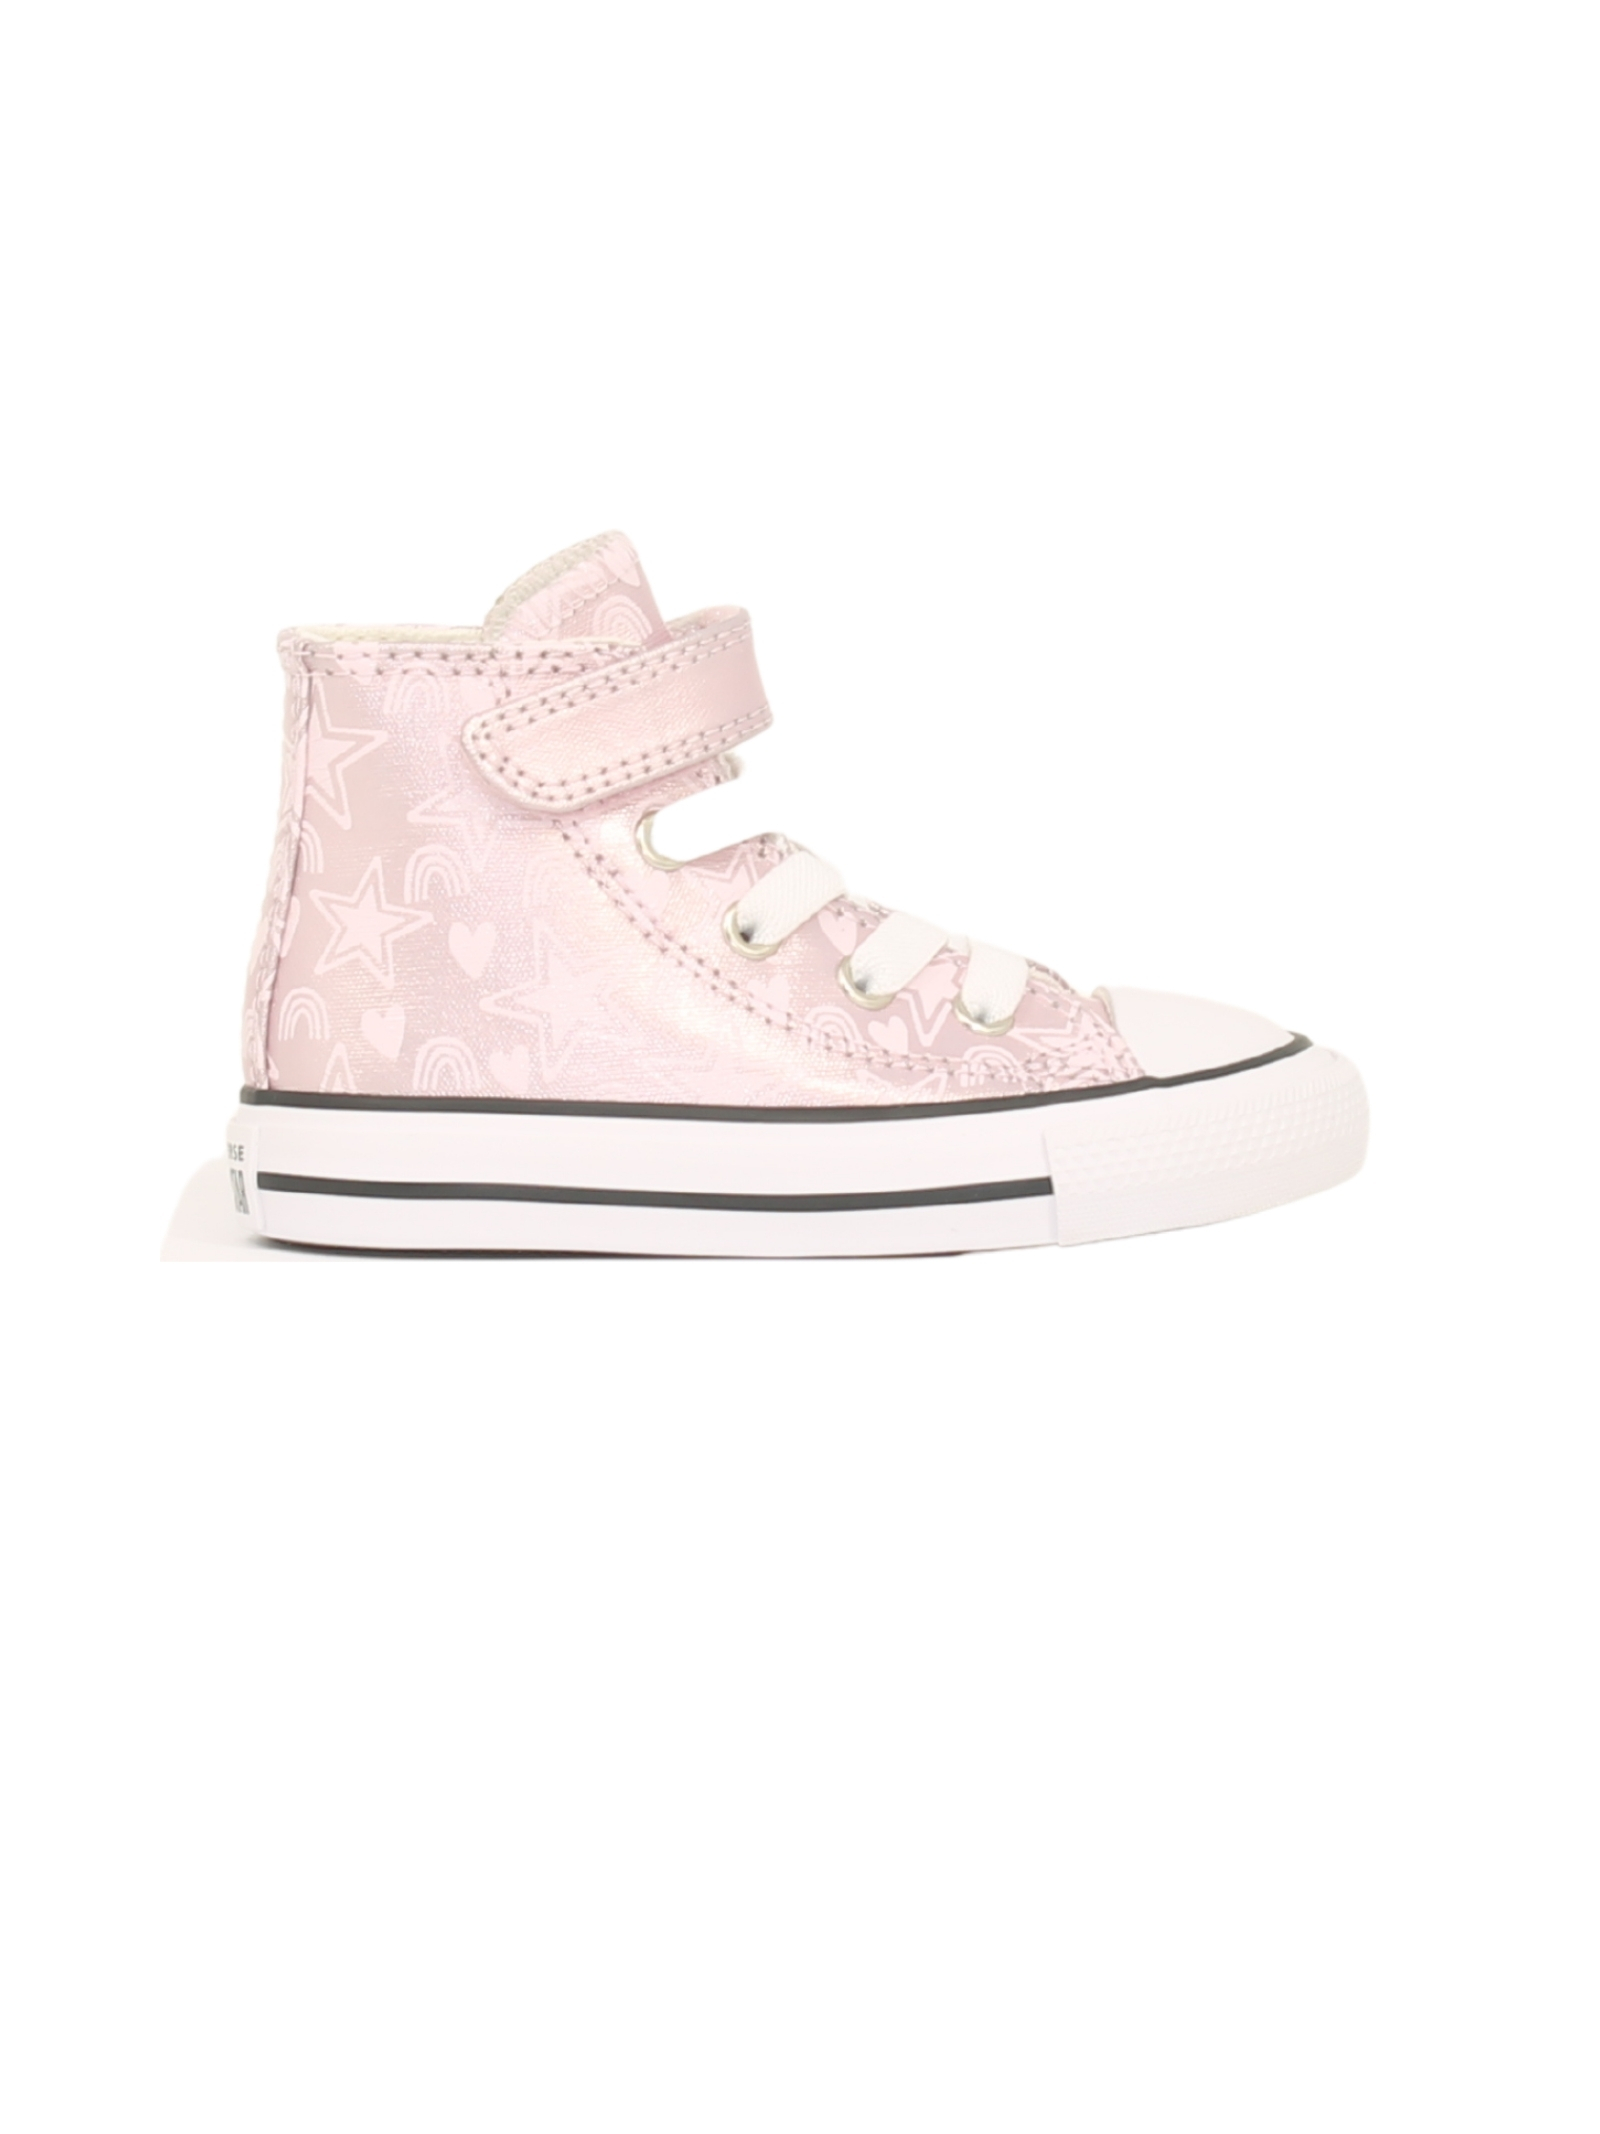 Sneakers Simil pelle Bambina CONVERSE KIDS | Sneakers | 772476CROSA